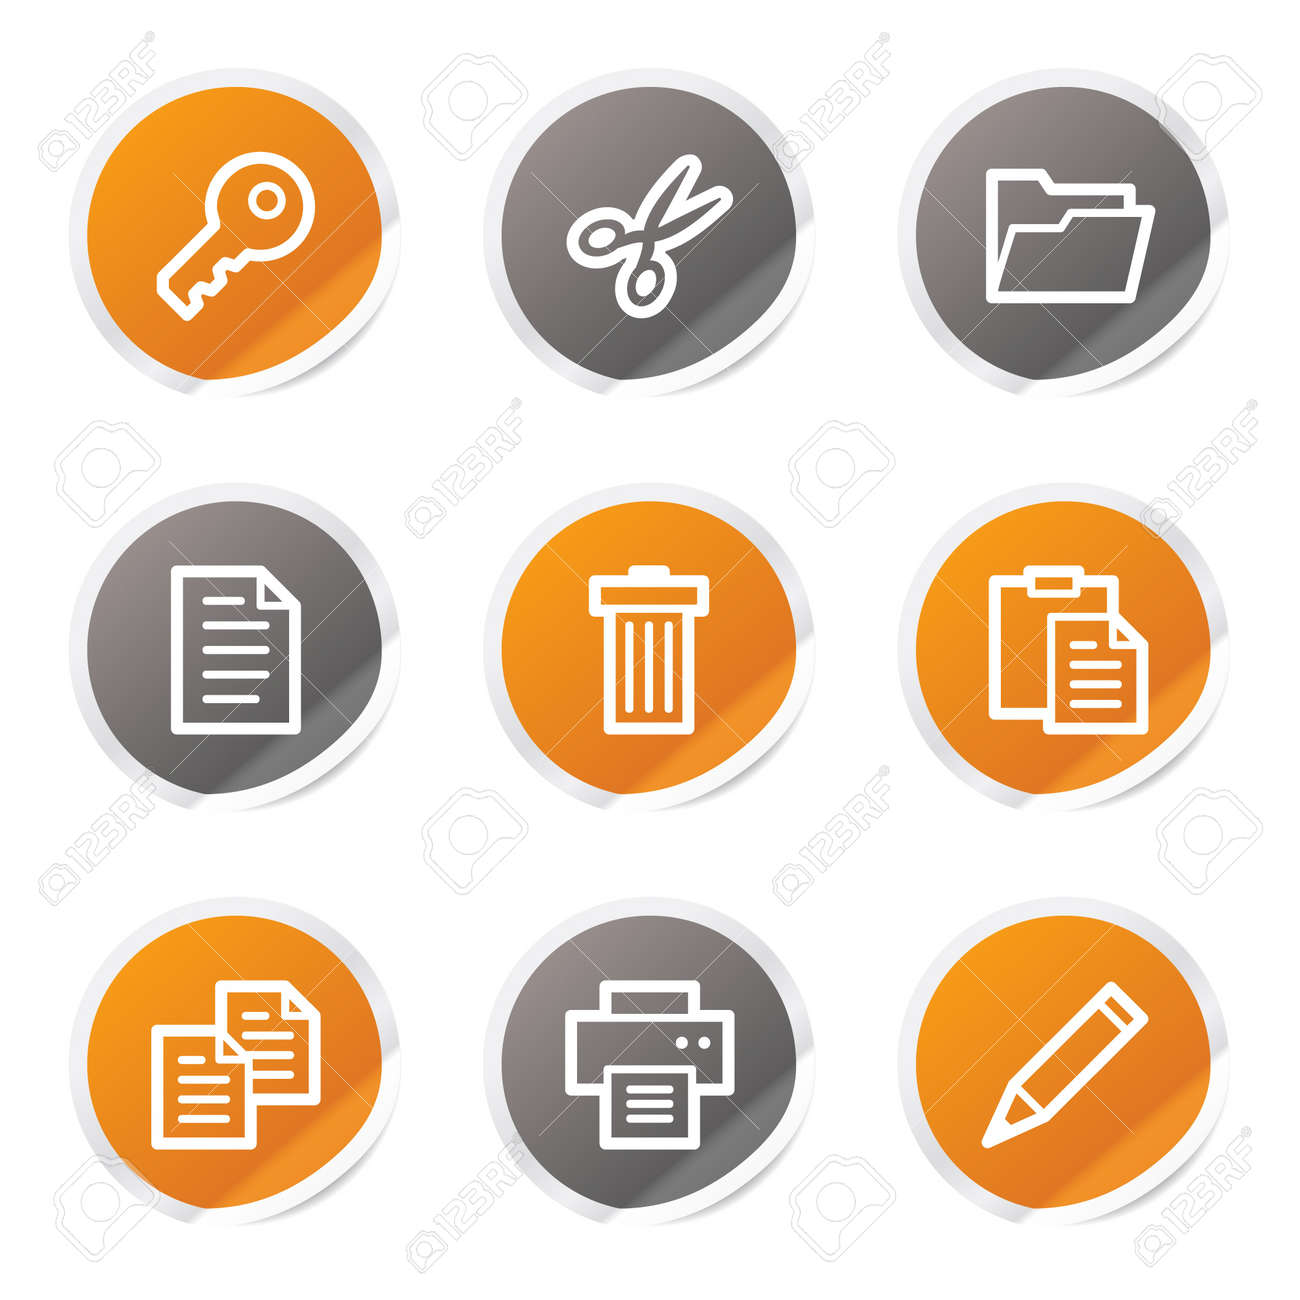 Document web icons set 1, orange and grey stickers Stock Vector - 6872905